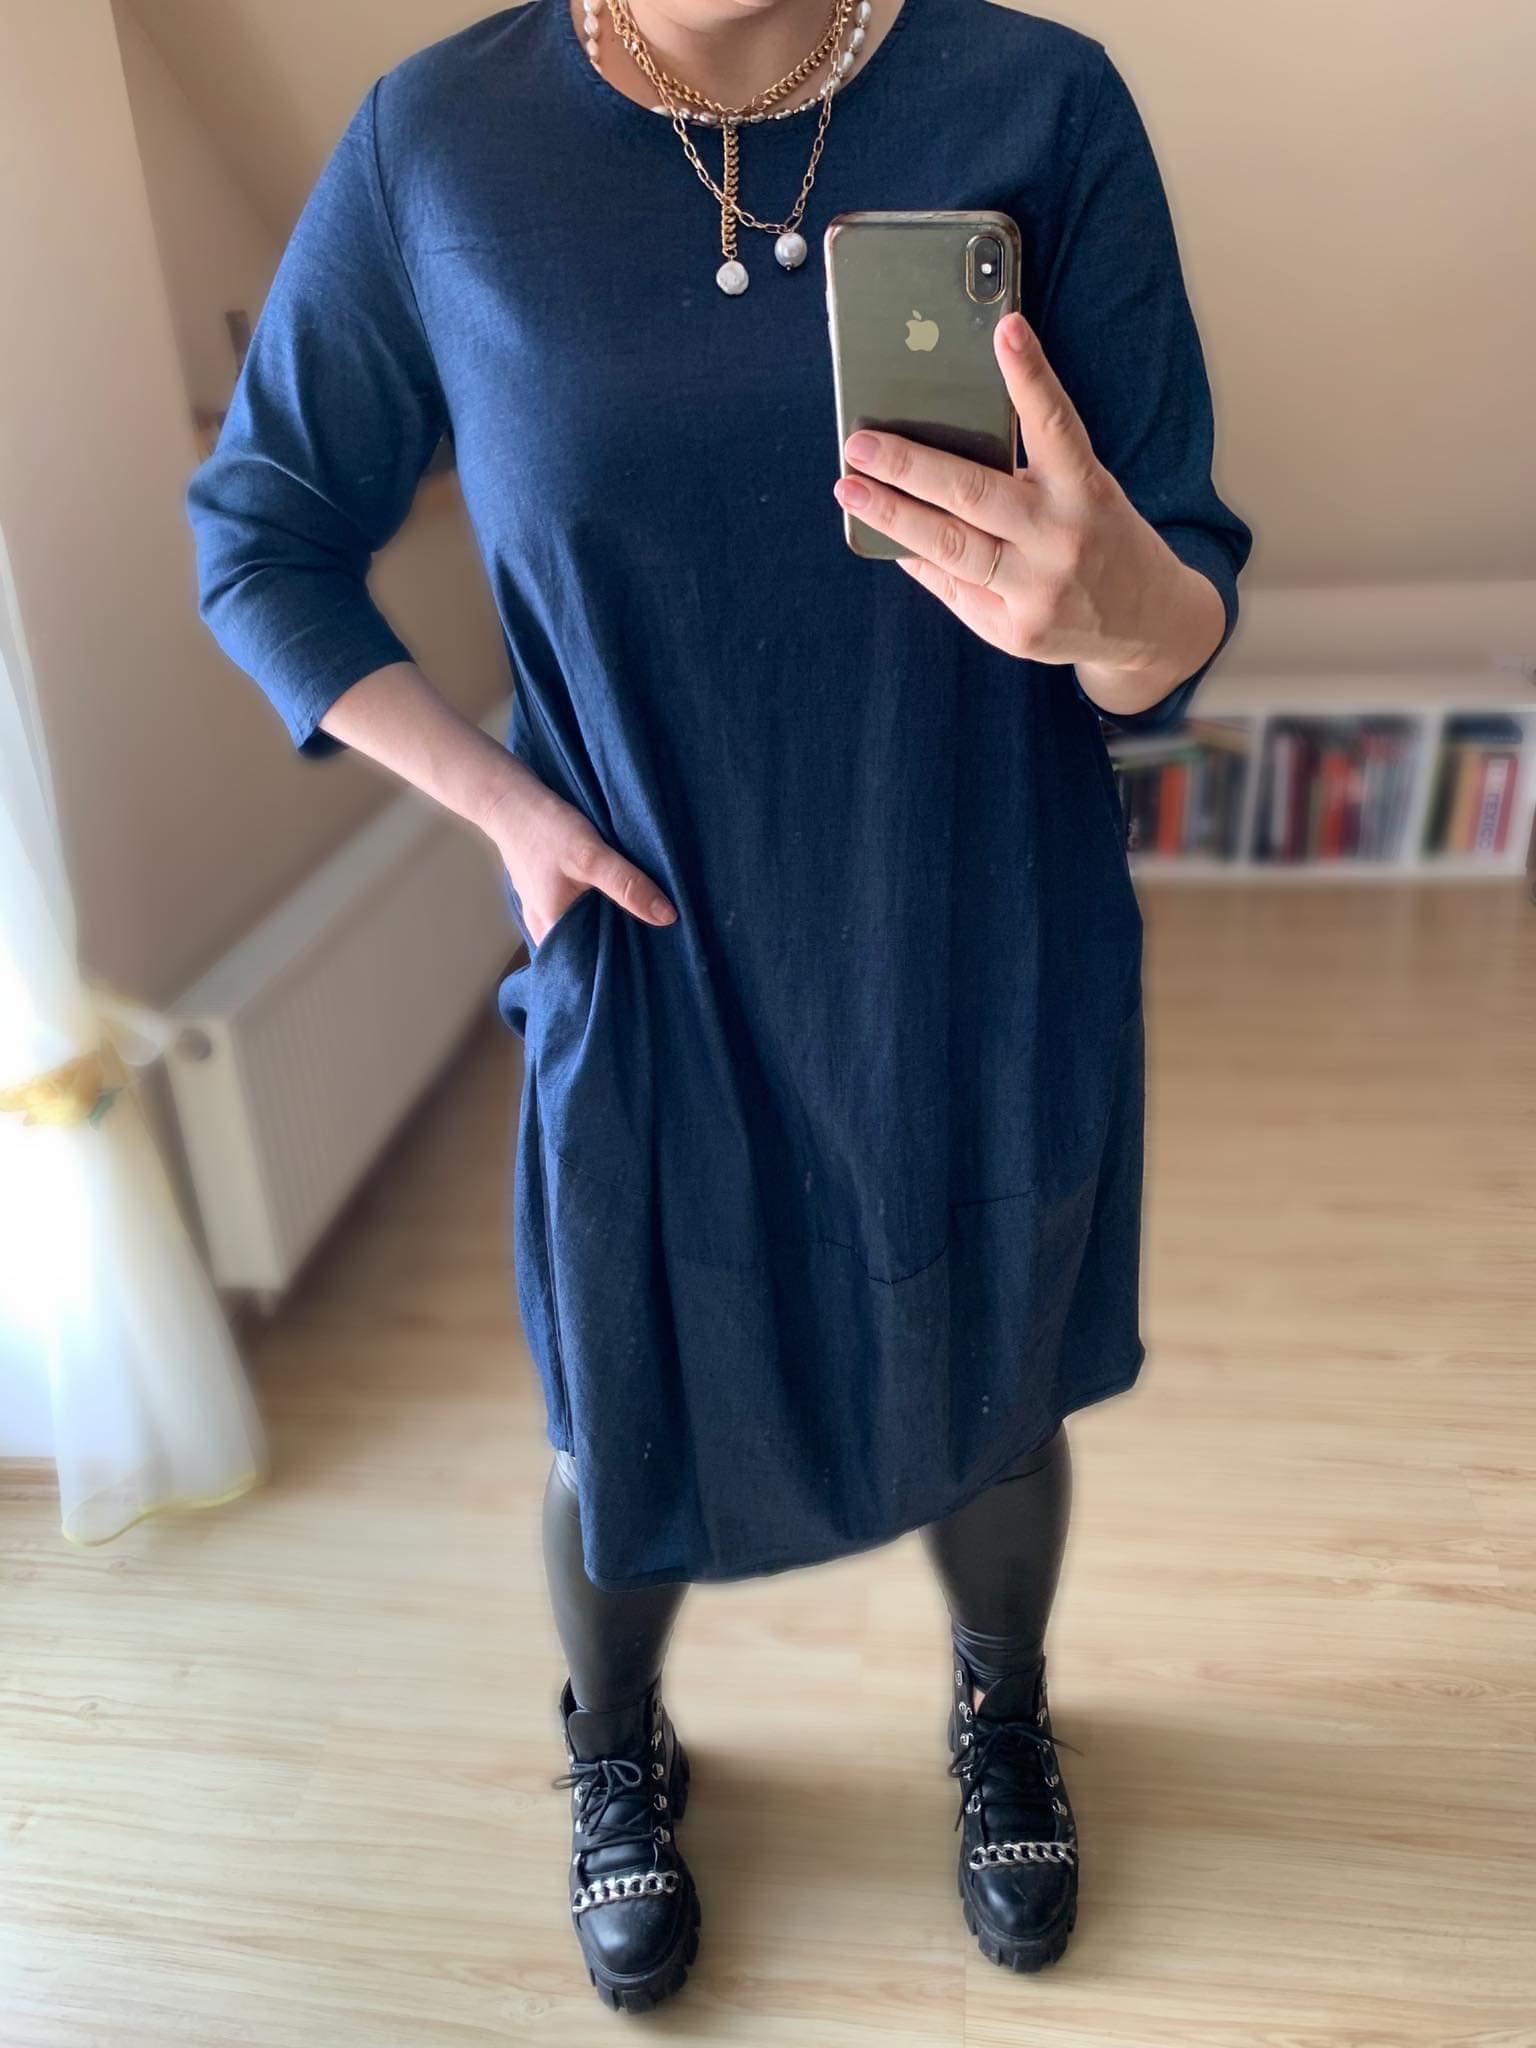 Džinsinè oversized suknelè su kišenèmis kokono tipo